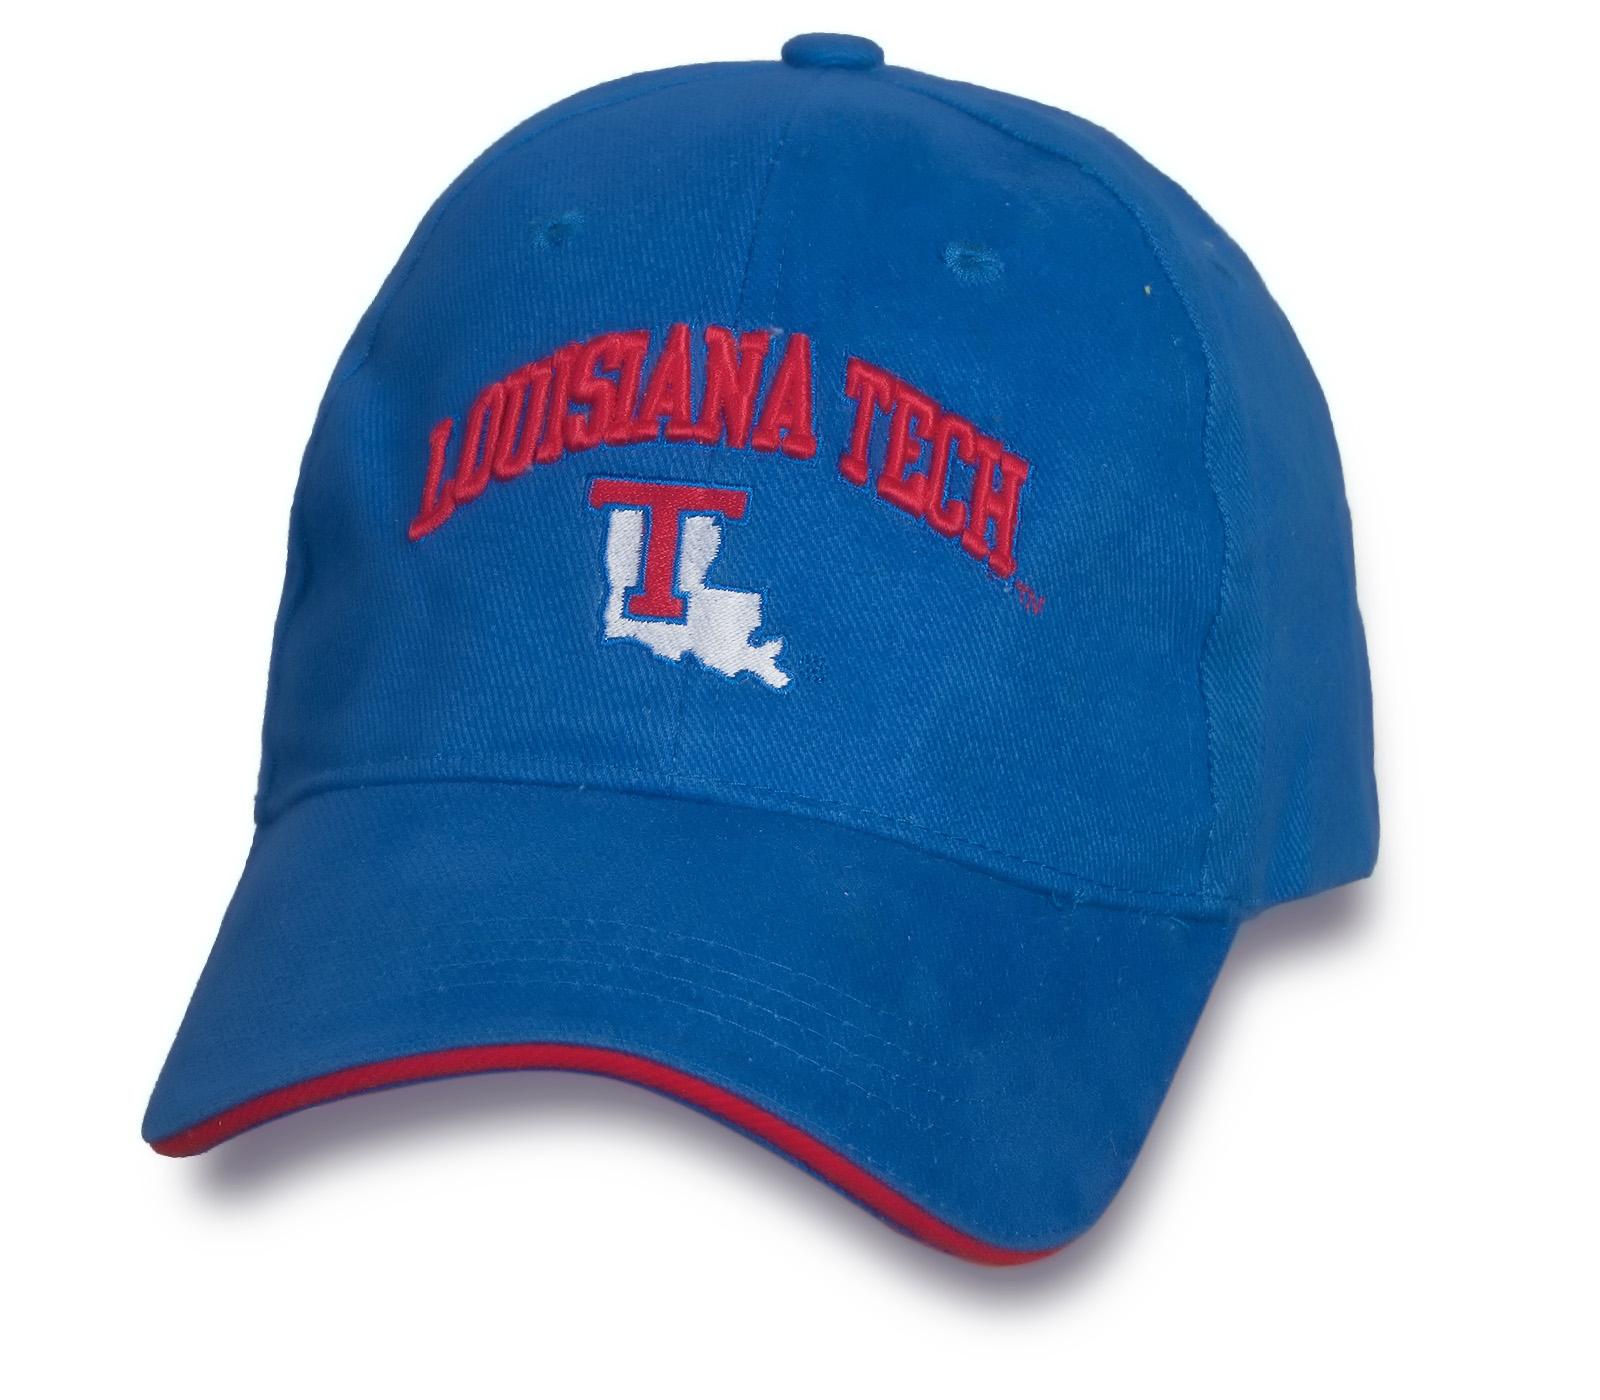 Молодежная синяя бейсболка Louisiana Tech